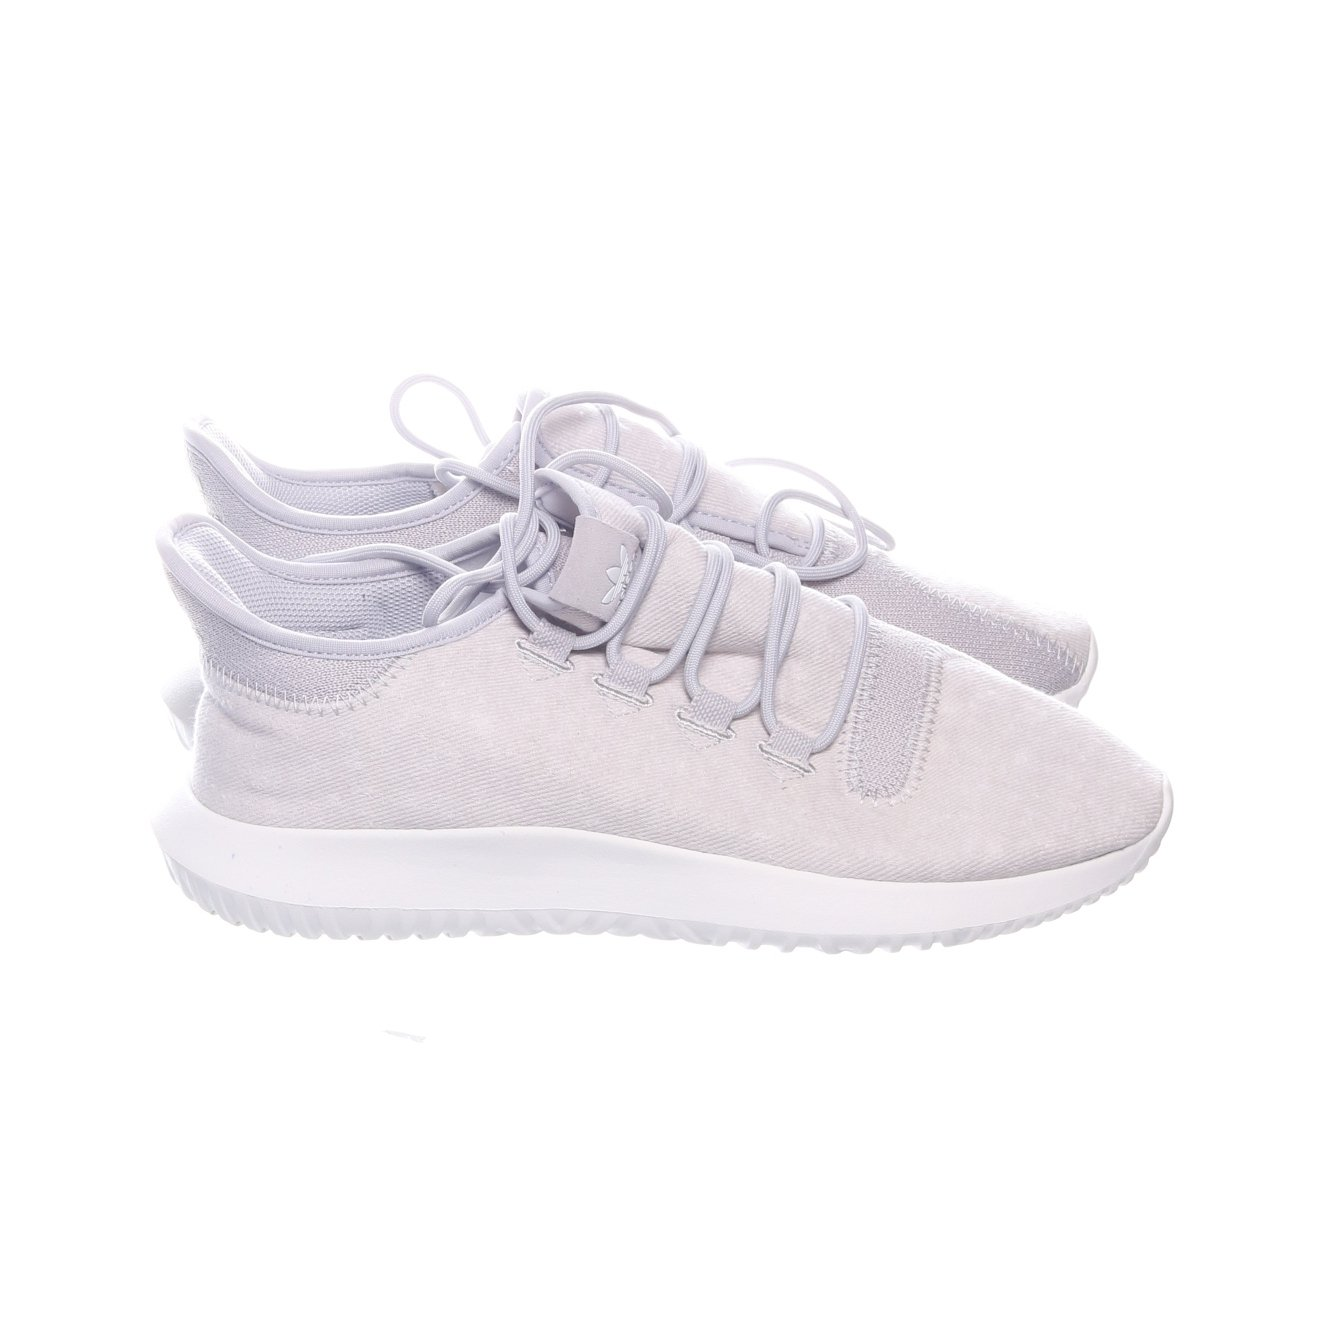 nike vita Vit Gul Svart Nike Air Max Sneakers : nike air